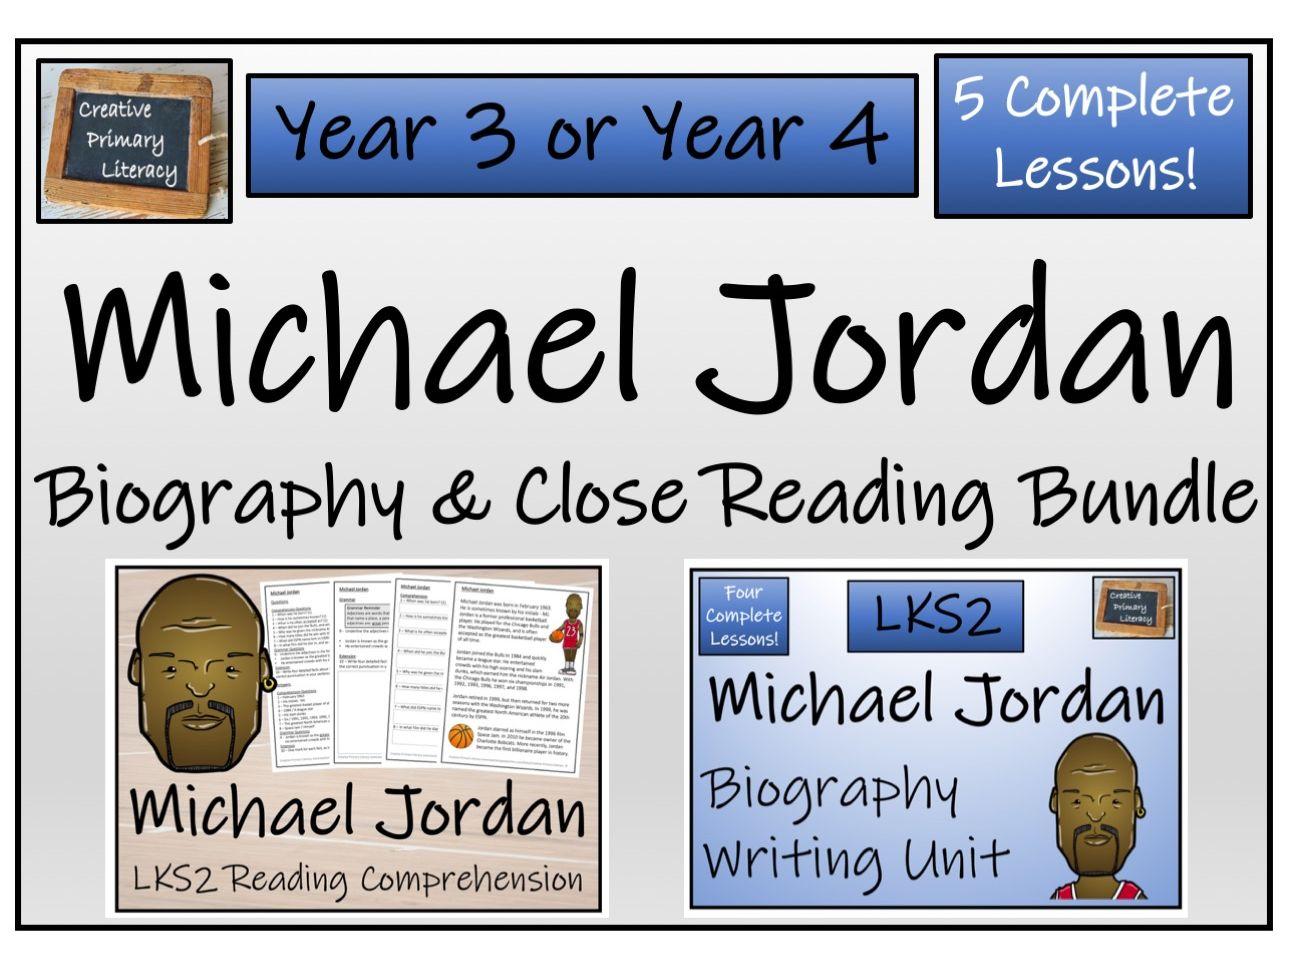 LKS2 Literacy - Michael Jordan Reading Comprehension & Biography Bundle